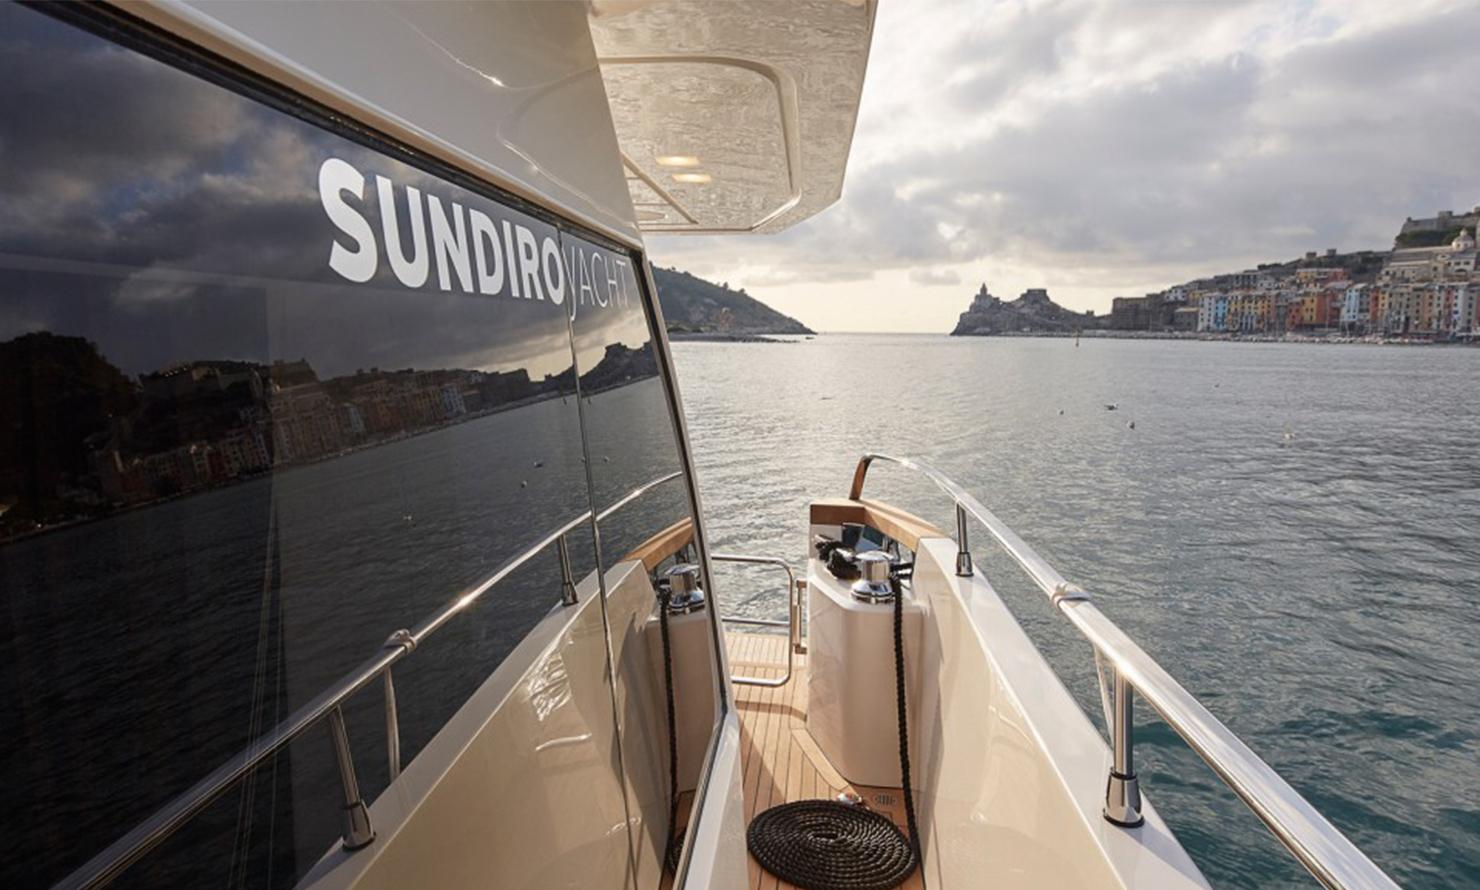 https://kubelibre.com/uploads/Slider-work-tutti-clienti/sundiro-yacht-l-eccelenza-italiana-sbarca-in-cina-7.jpg